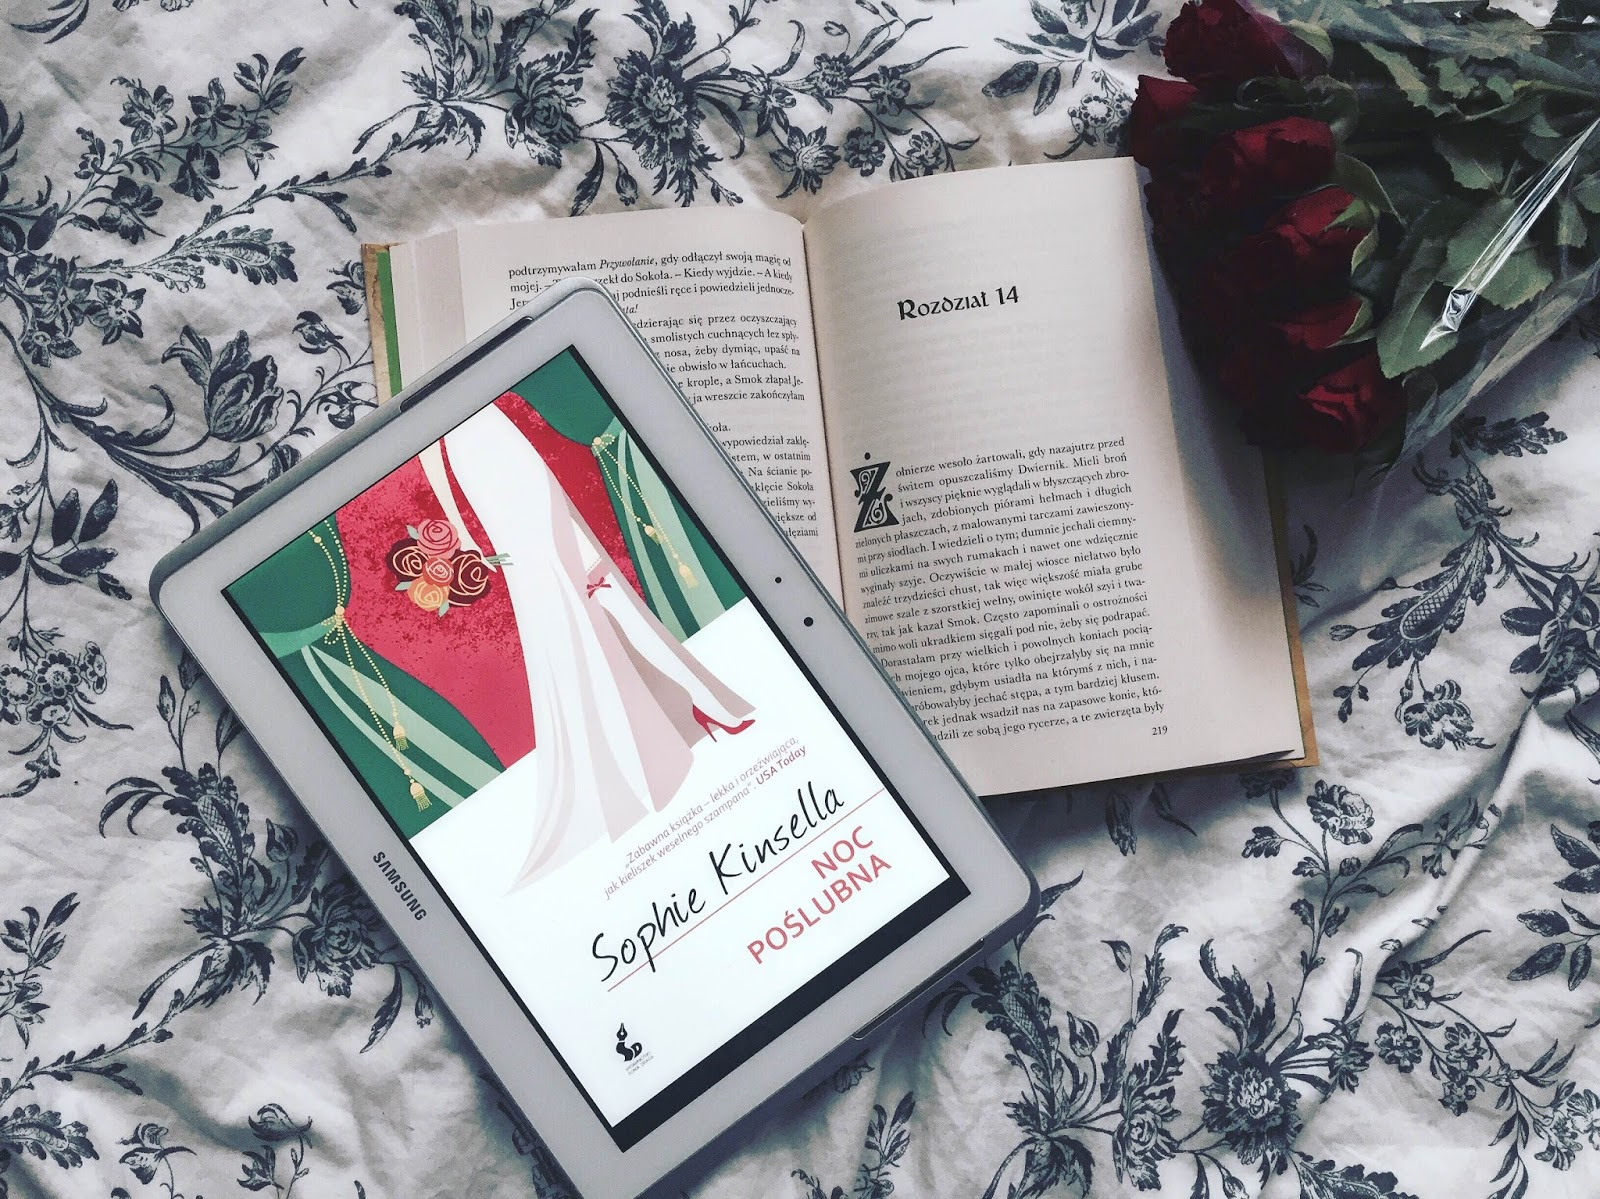 Noc poślubna, Sophie Kinsella